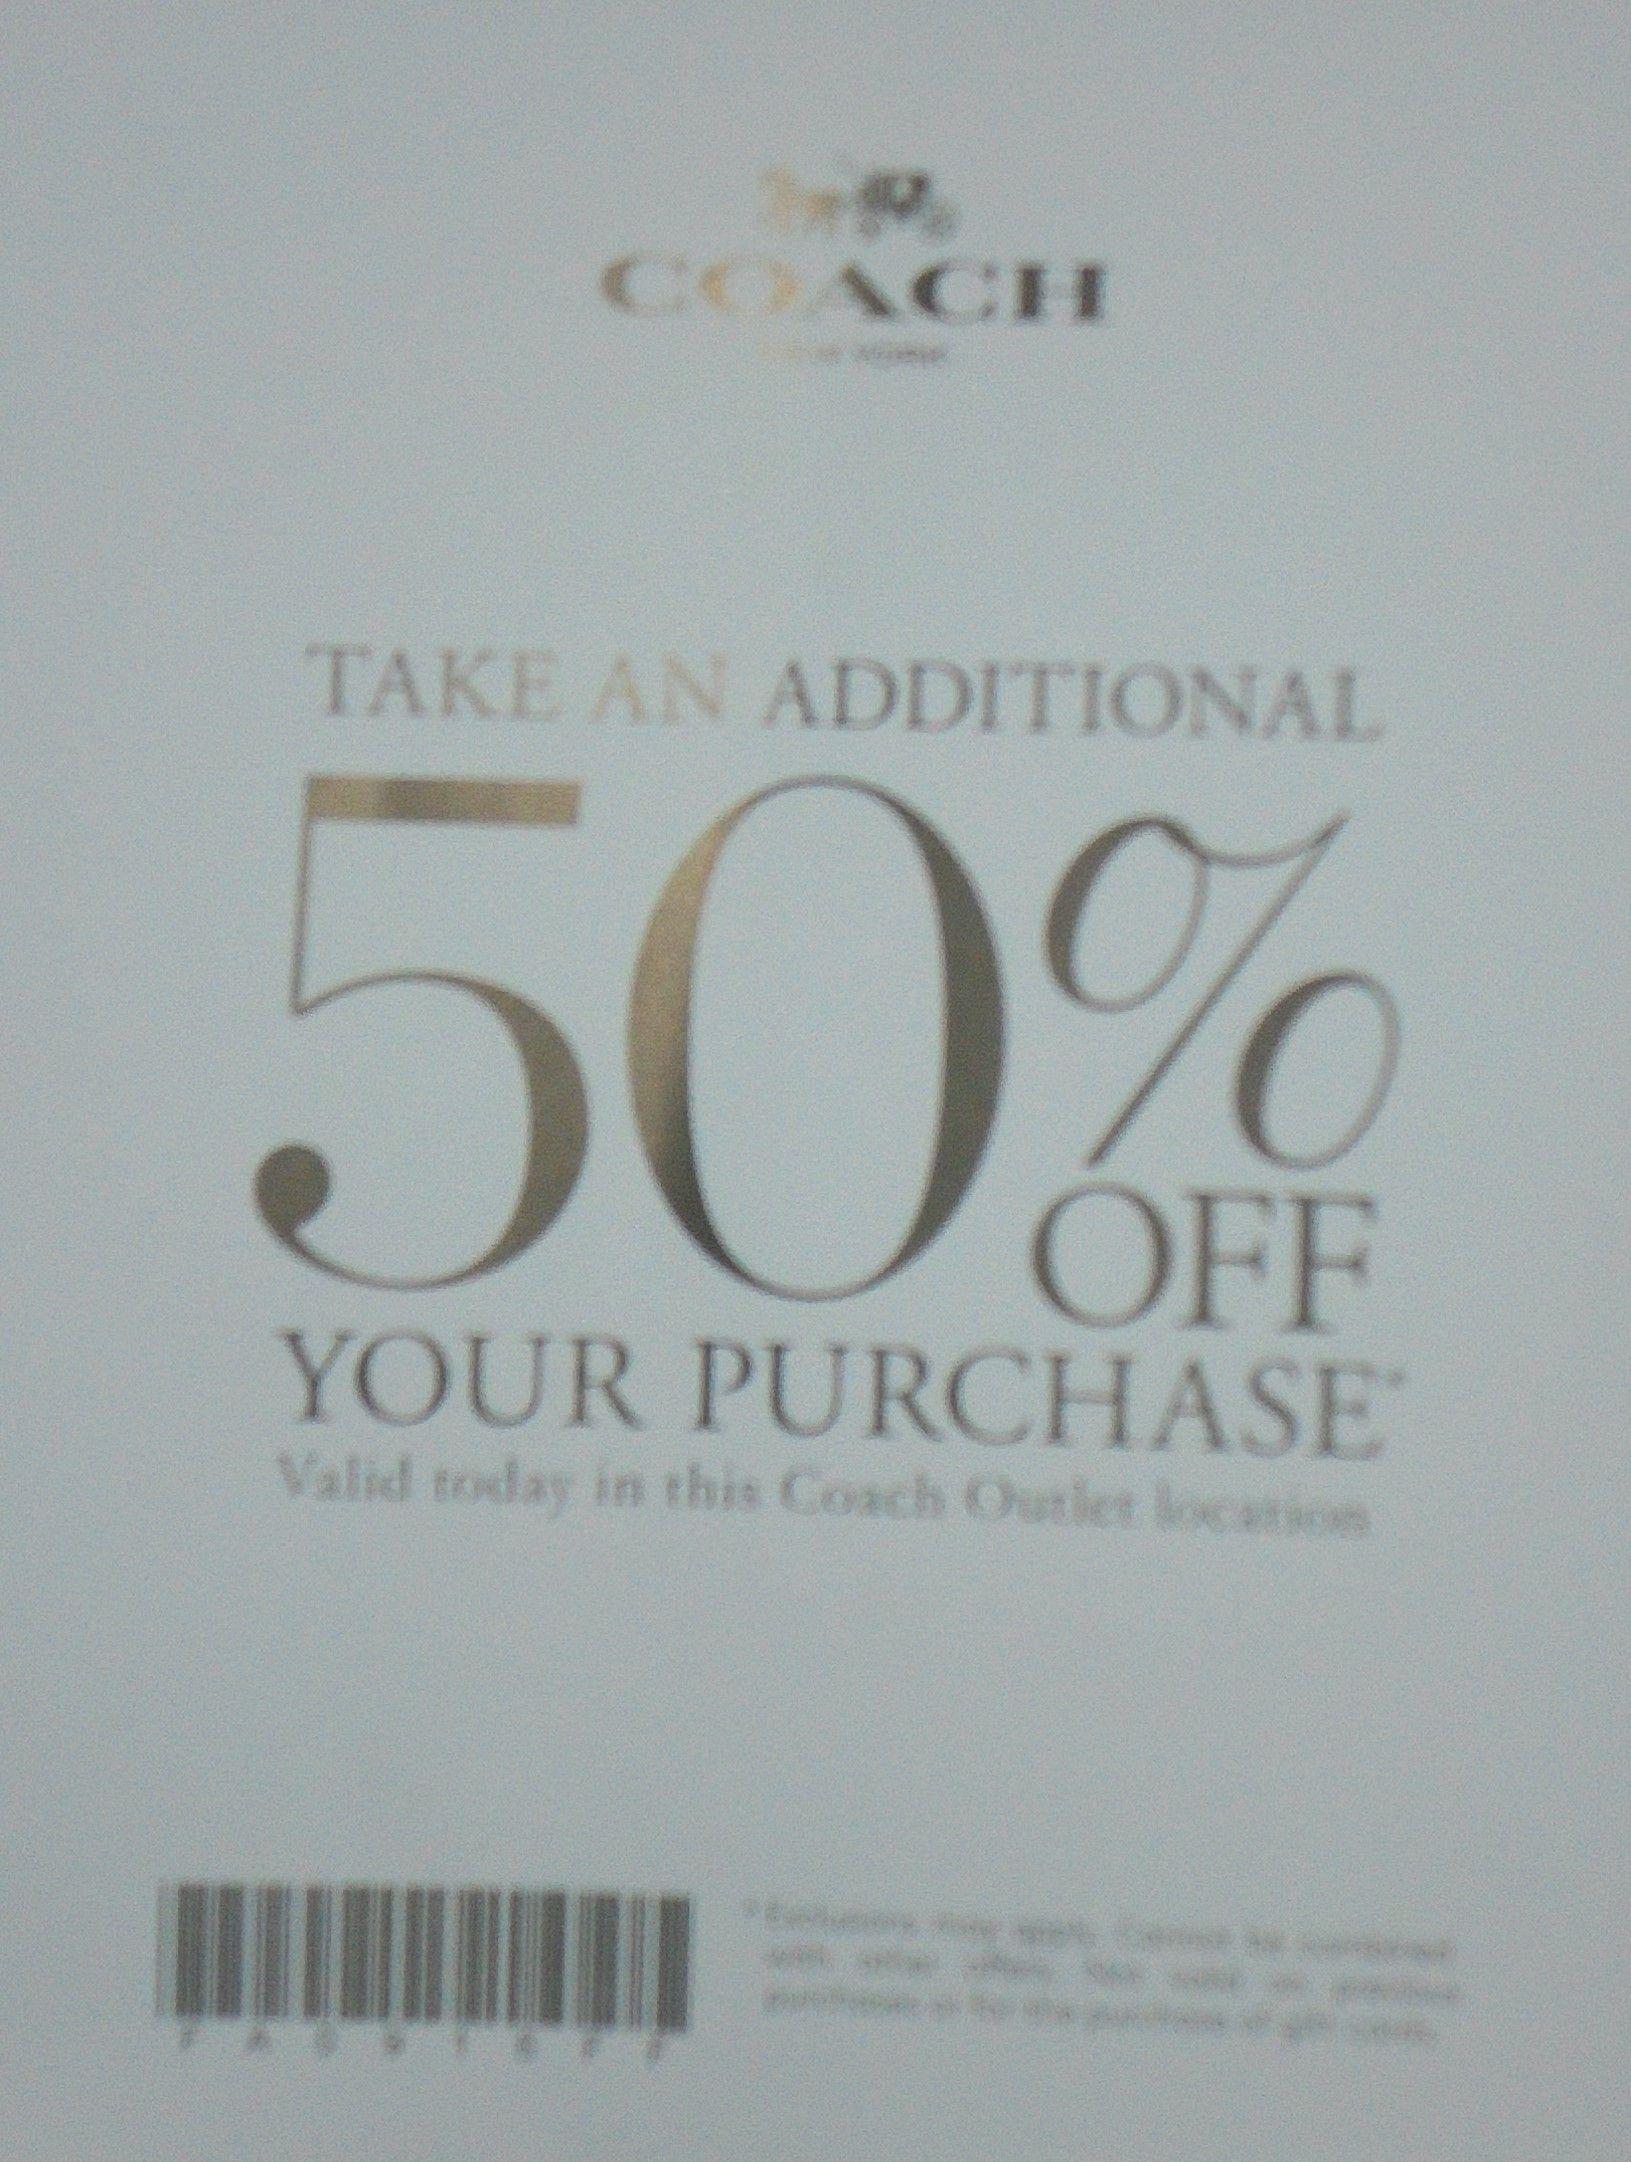 #CoachFactoryStore & #CoachDiscounts on #MarchSaturday @ #CoachStore in @ #RehobothBeach #Delaware - http://www.drewrynewsnetwork.com